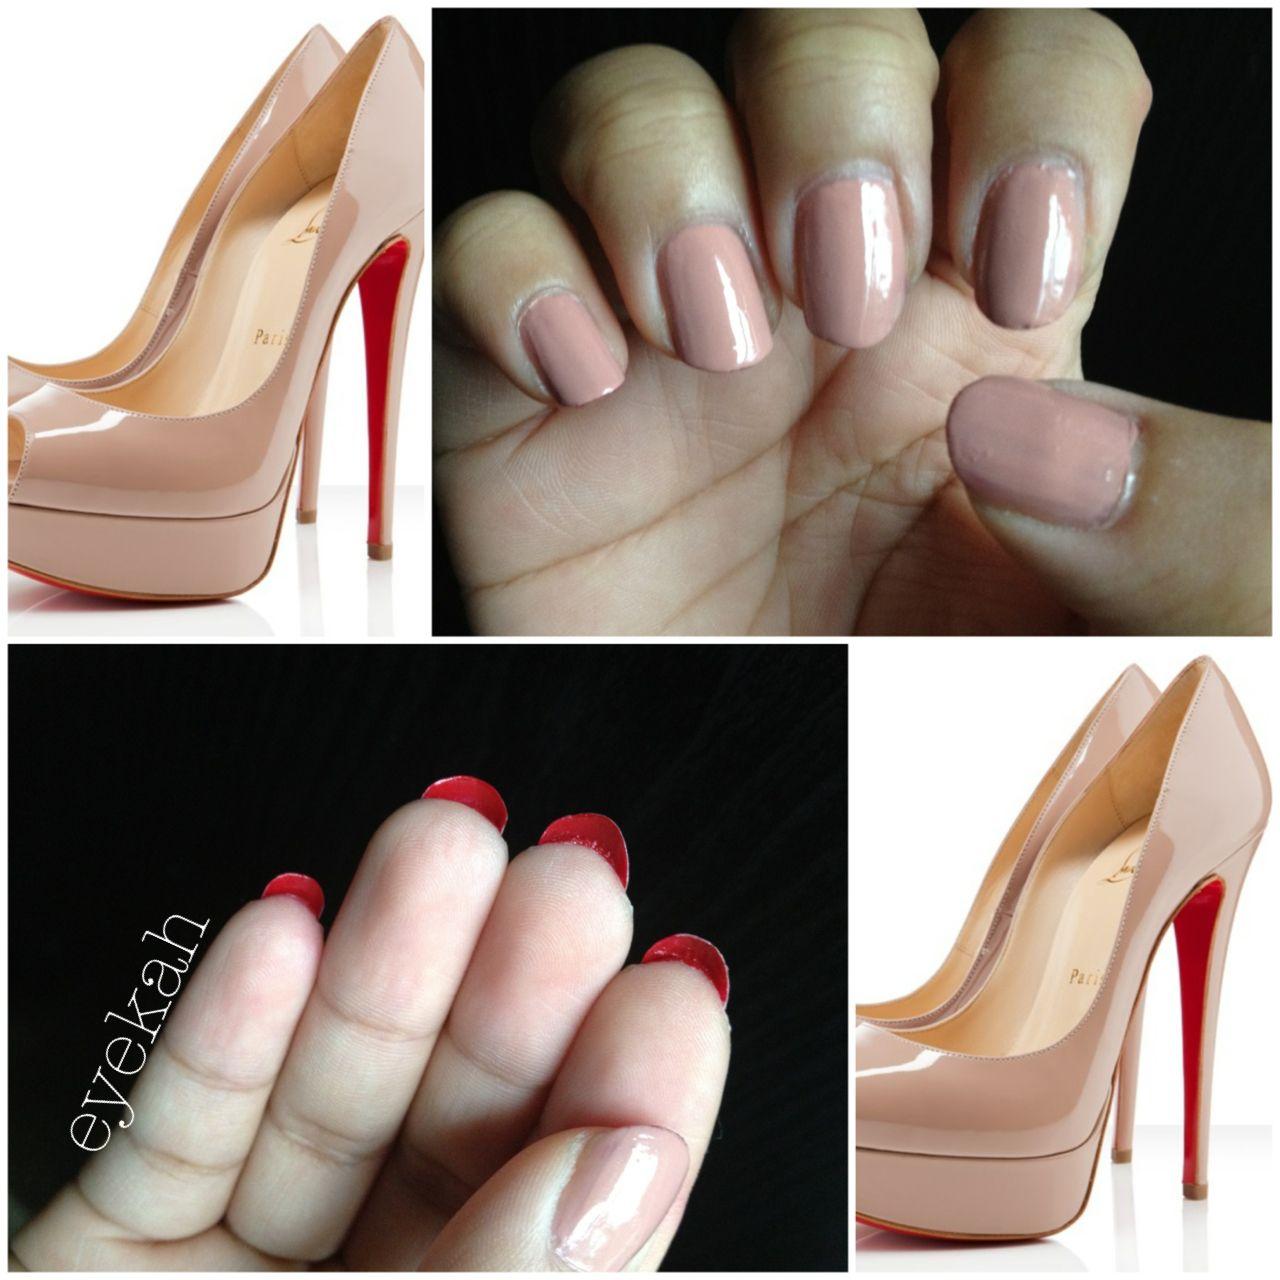 Louboutin inspired nails | Nails | Pinterest | Hair makeup and Makeup